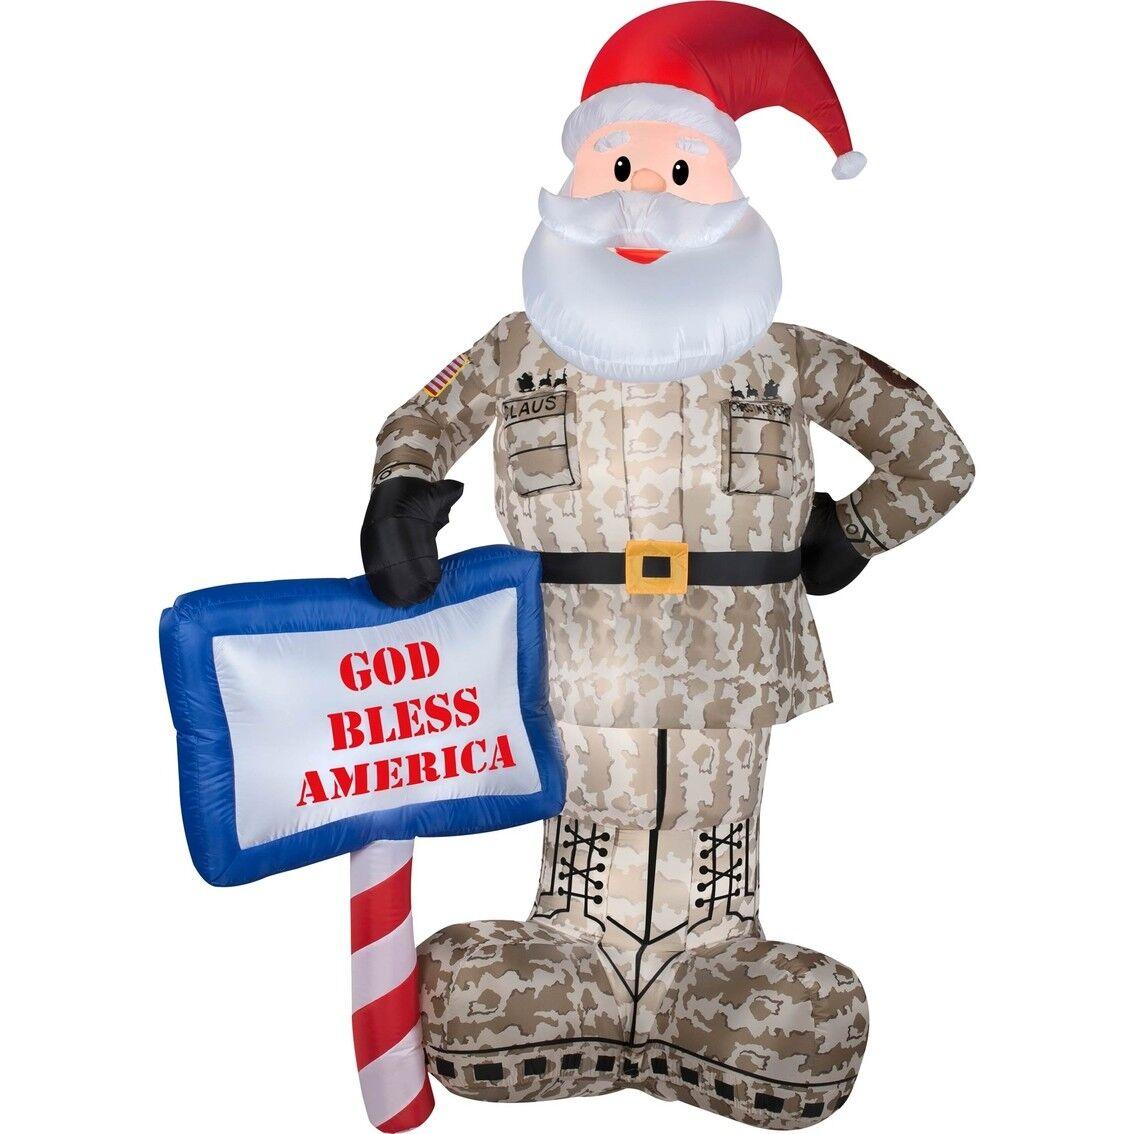 Christmas Airblown Military Santa 7' Tall - Yard Ornament